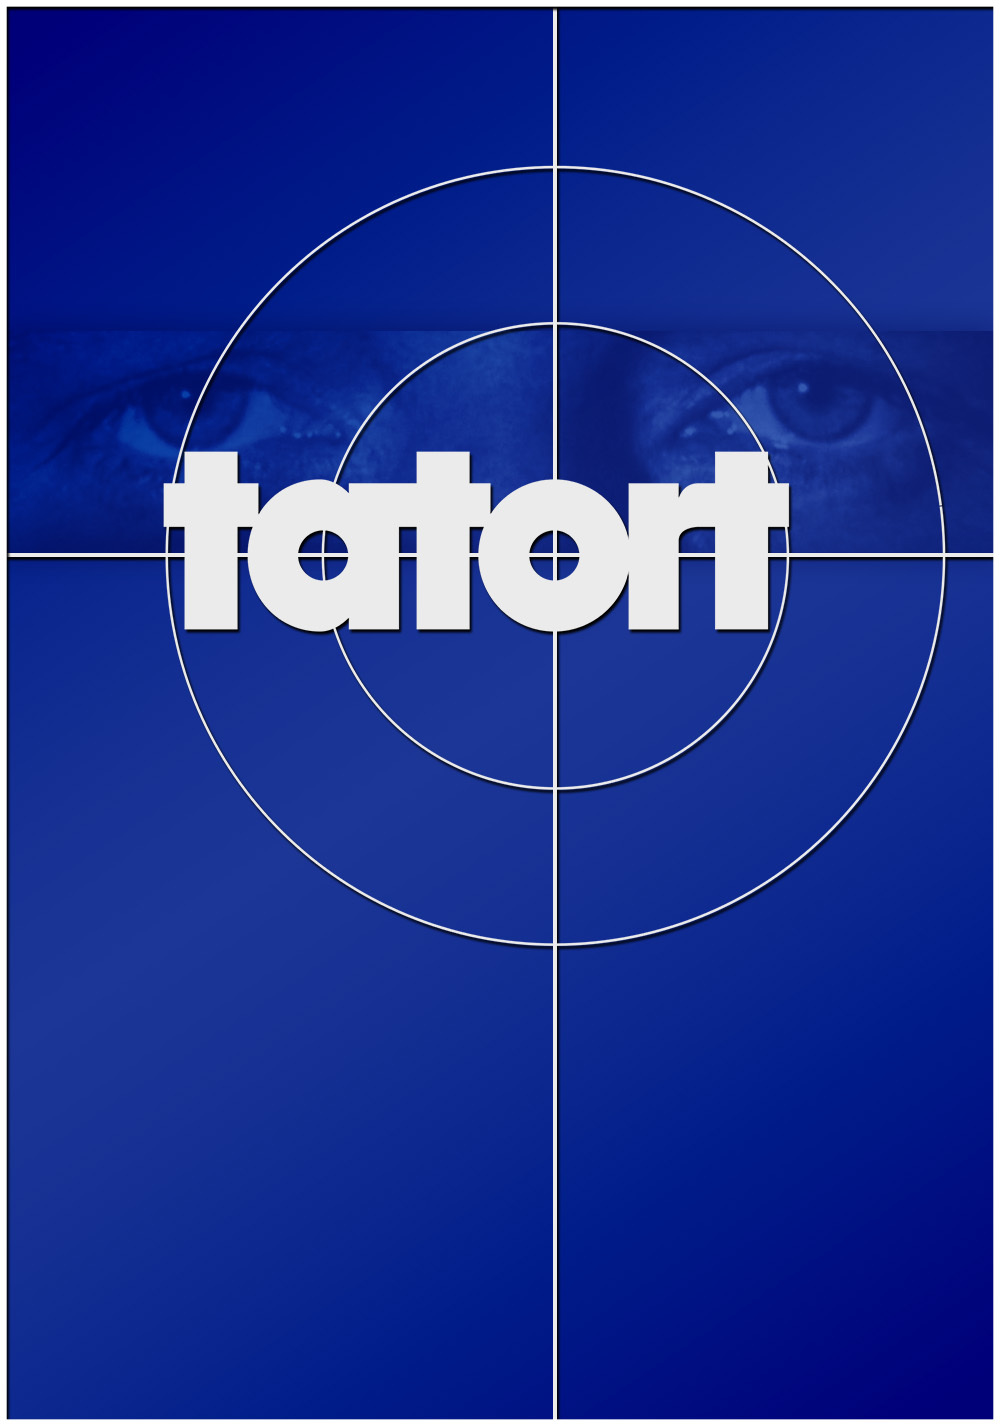 Tatort Symbol